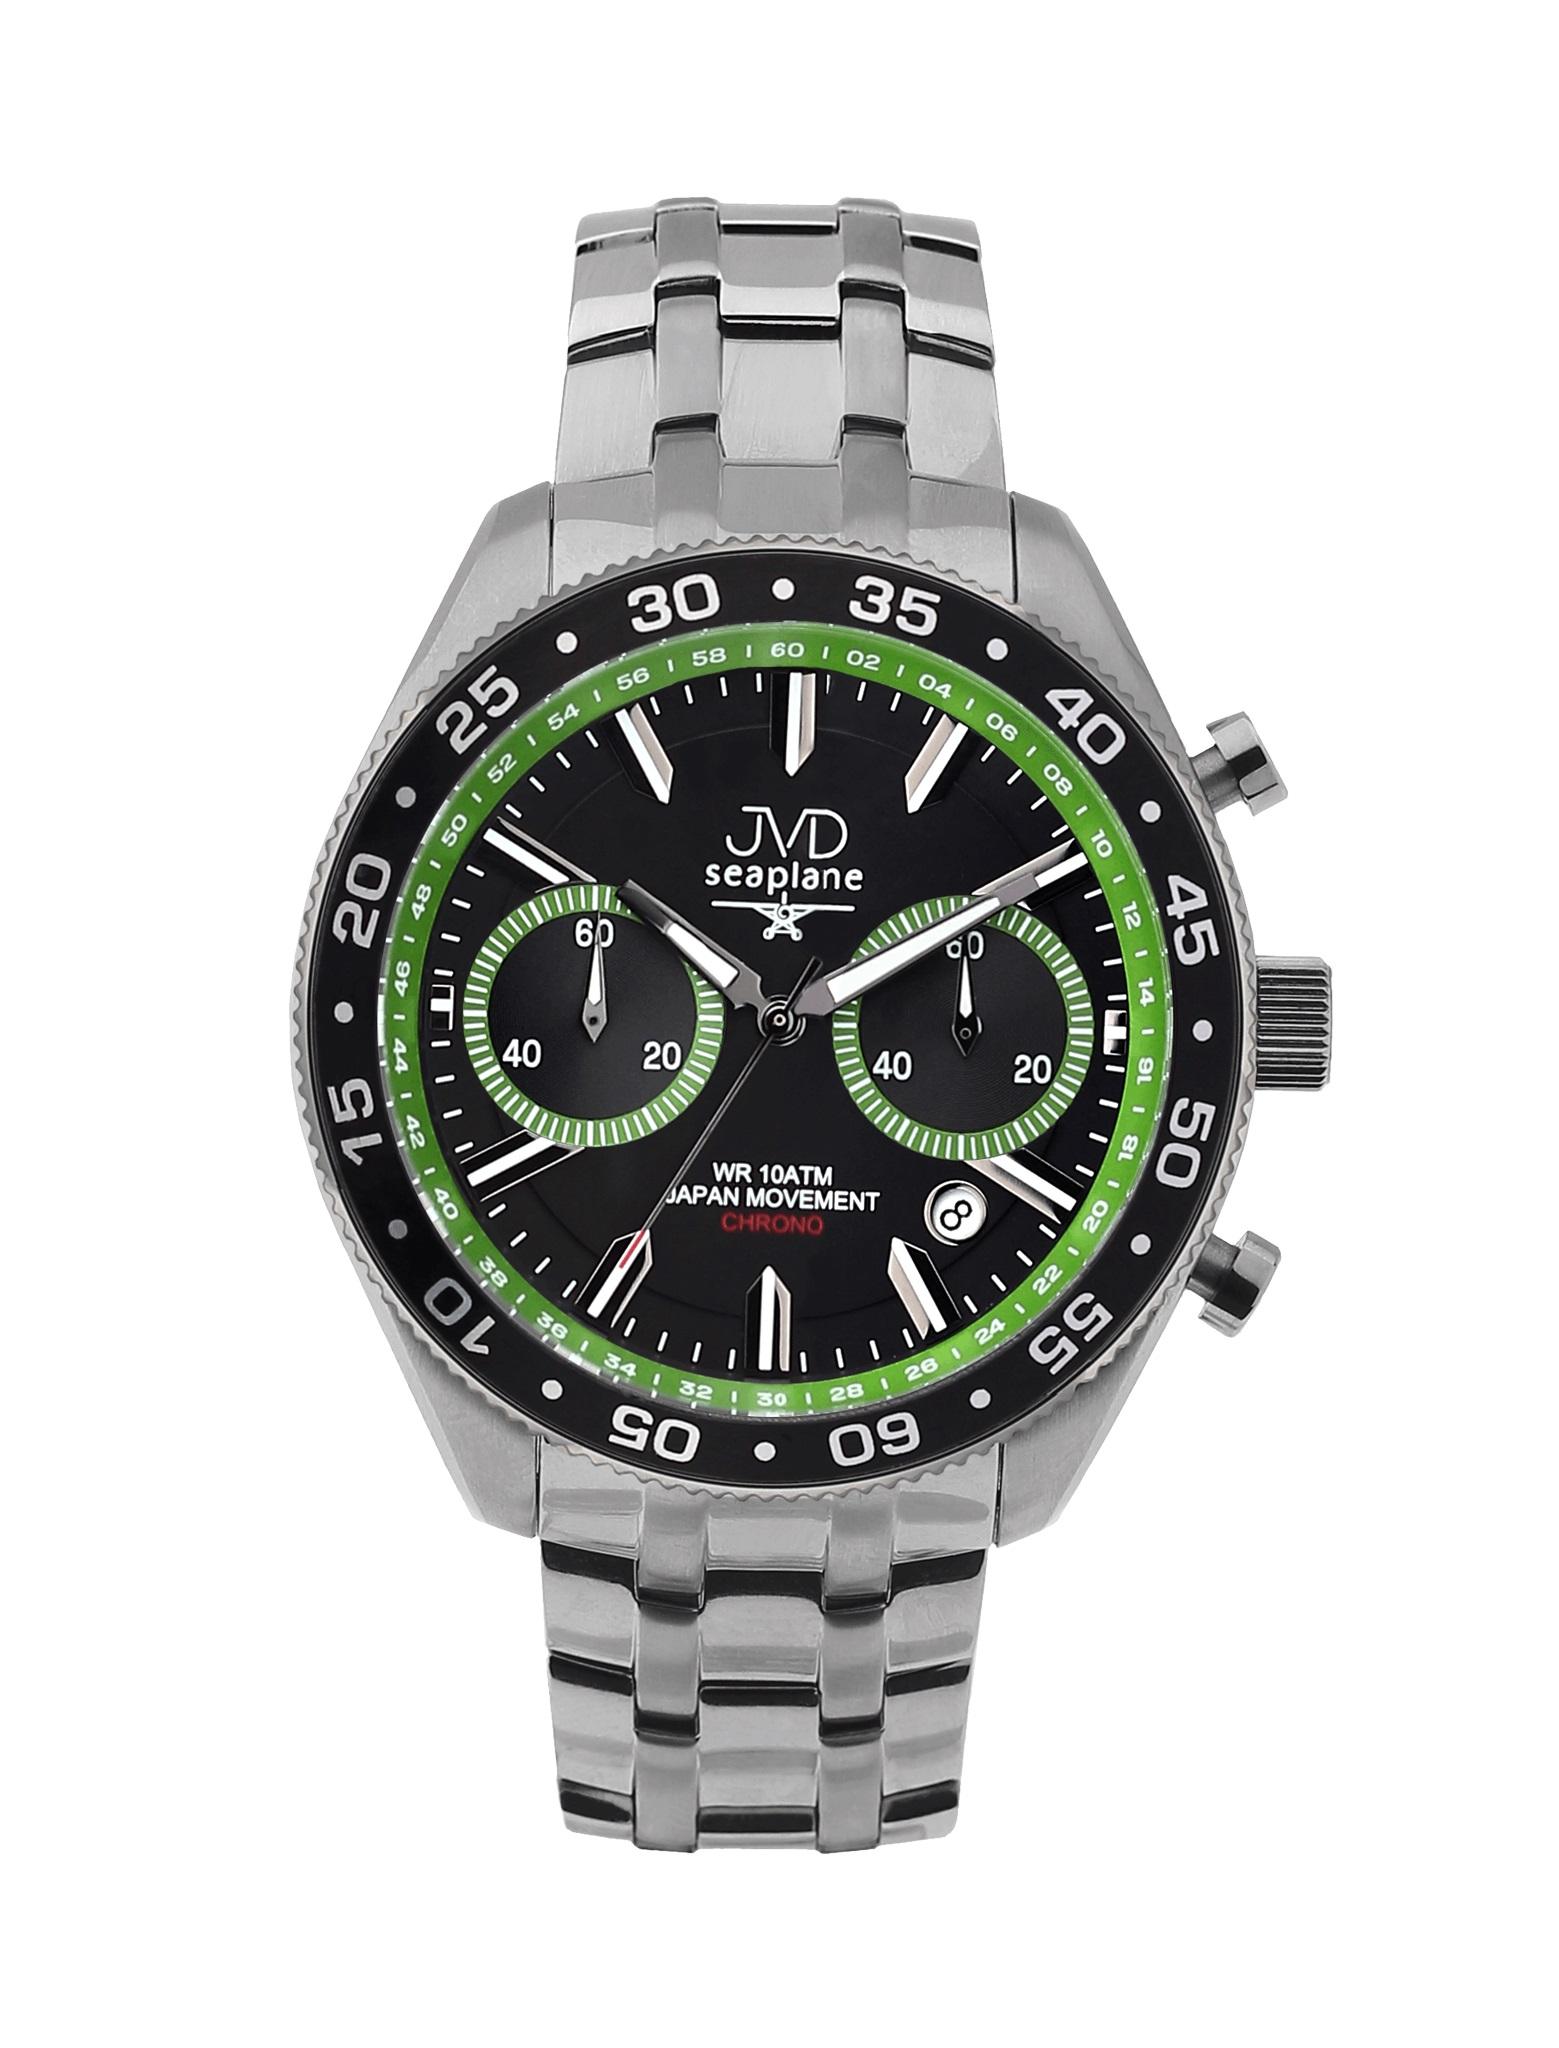 Pánské vodotěsné odolné náramkové hodinky Seaplane INFUSION J1117.3 (POŠTOVNÉ ZDARMA!!)